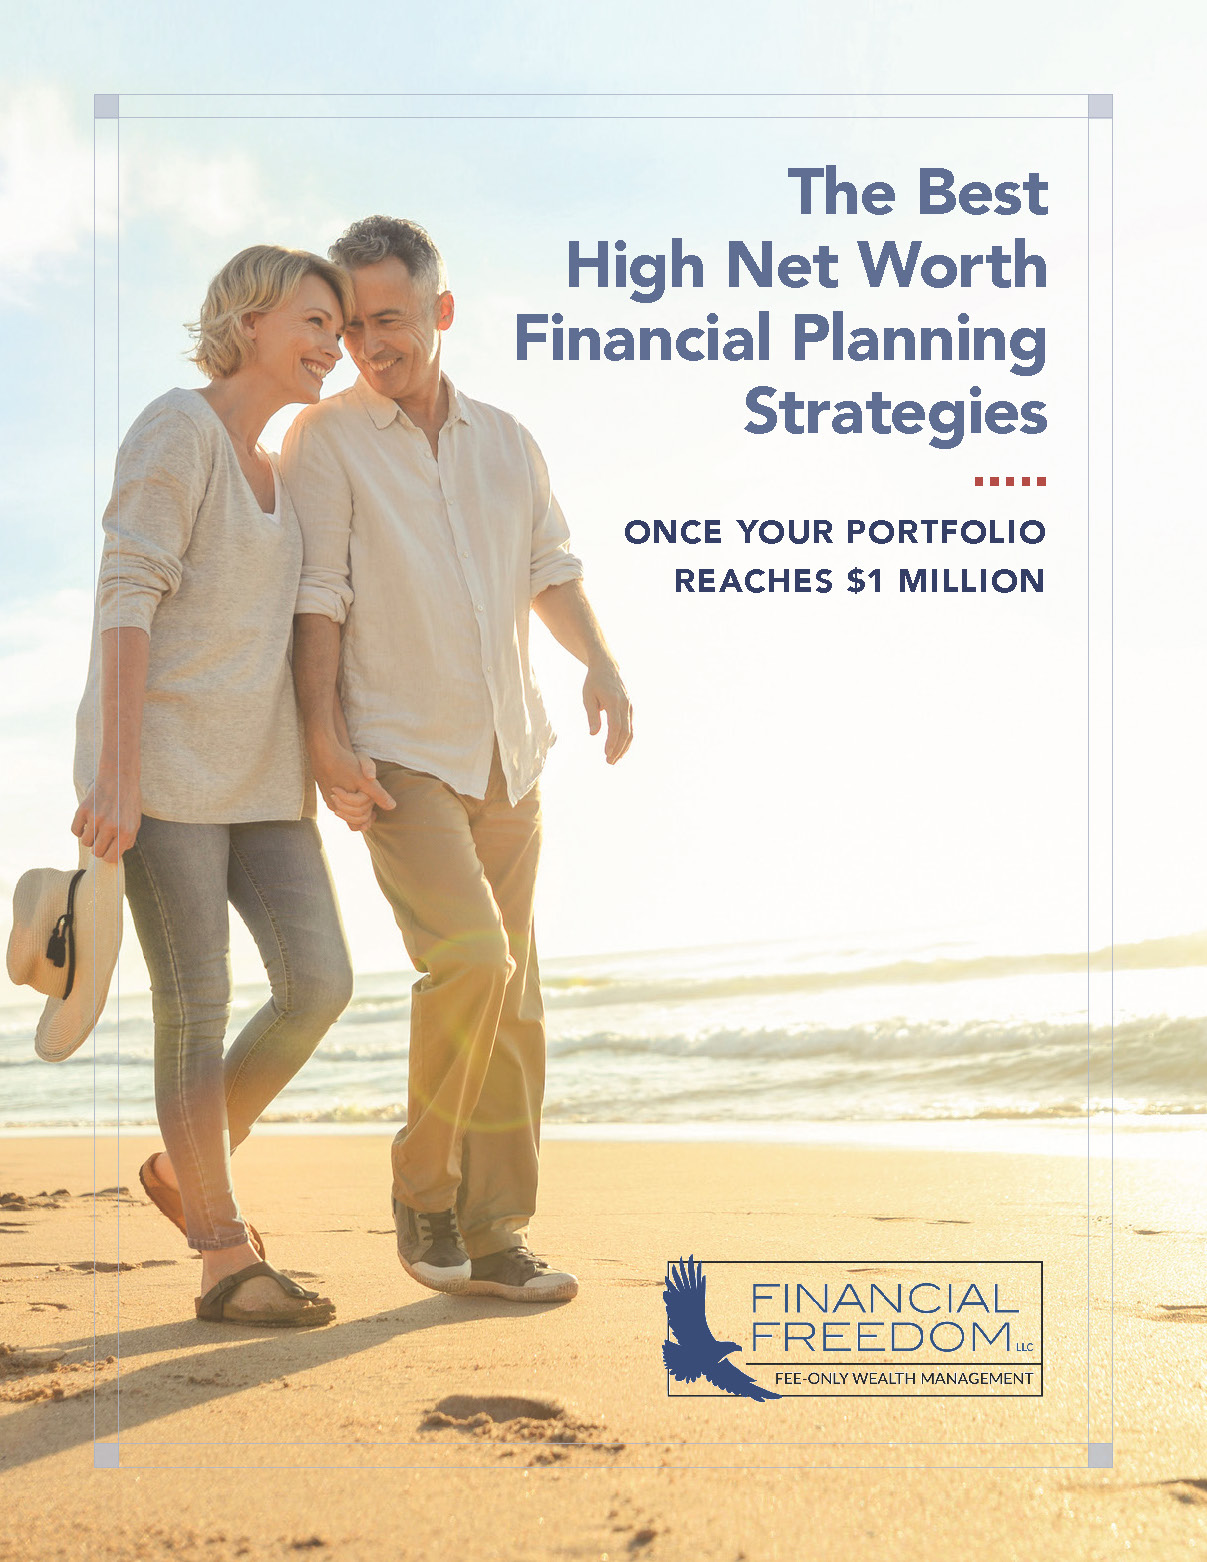 The Best High Net Worth Financial Planning Strategies